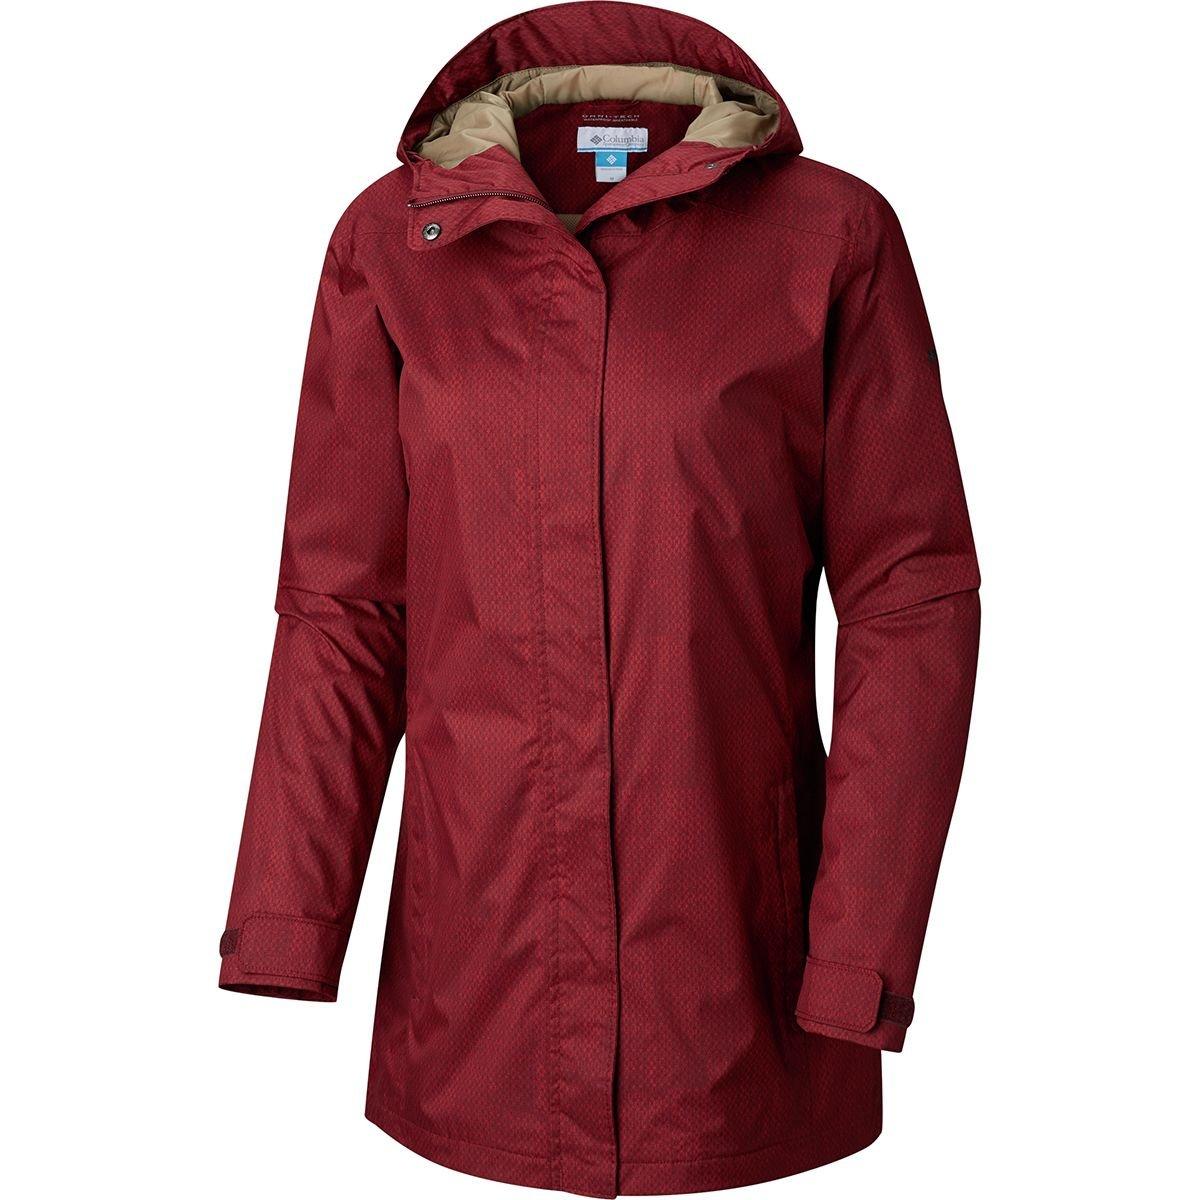 Amazon.com: Columbia Womens Splash A Little II Jacket: Sports & Outdoors